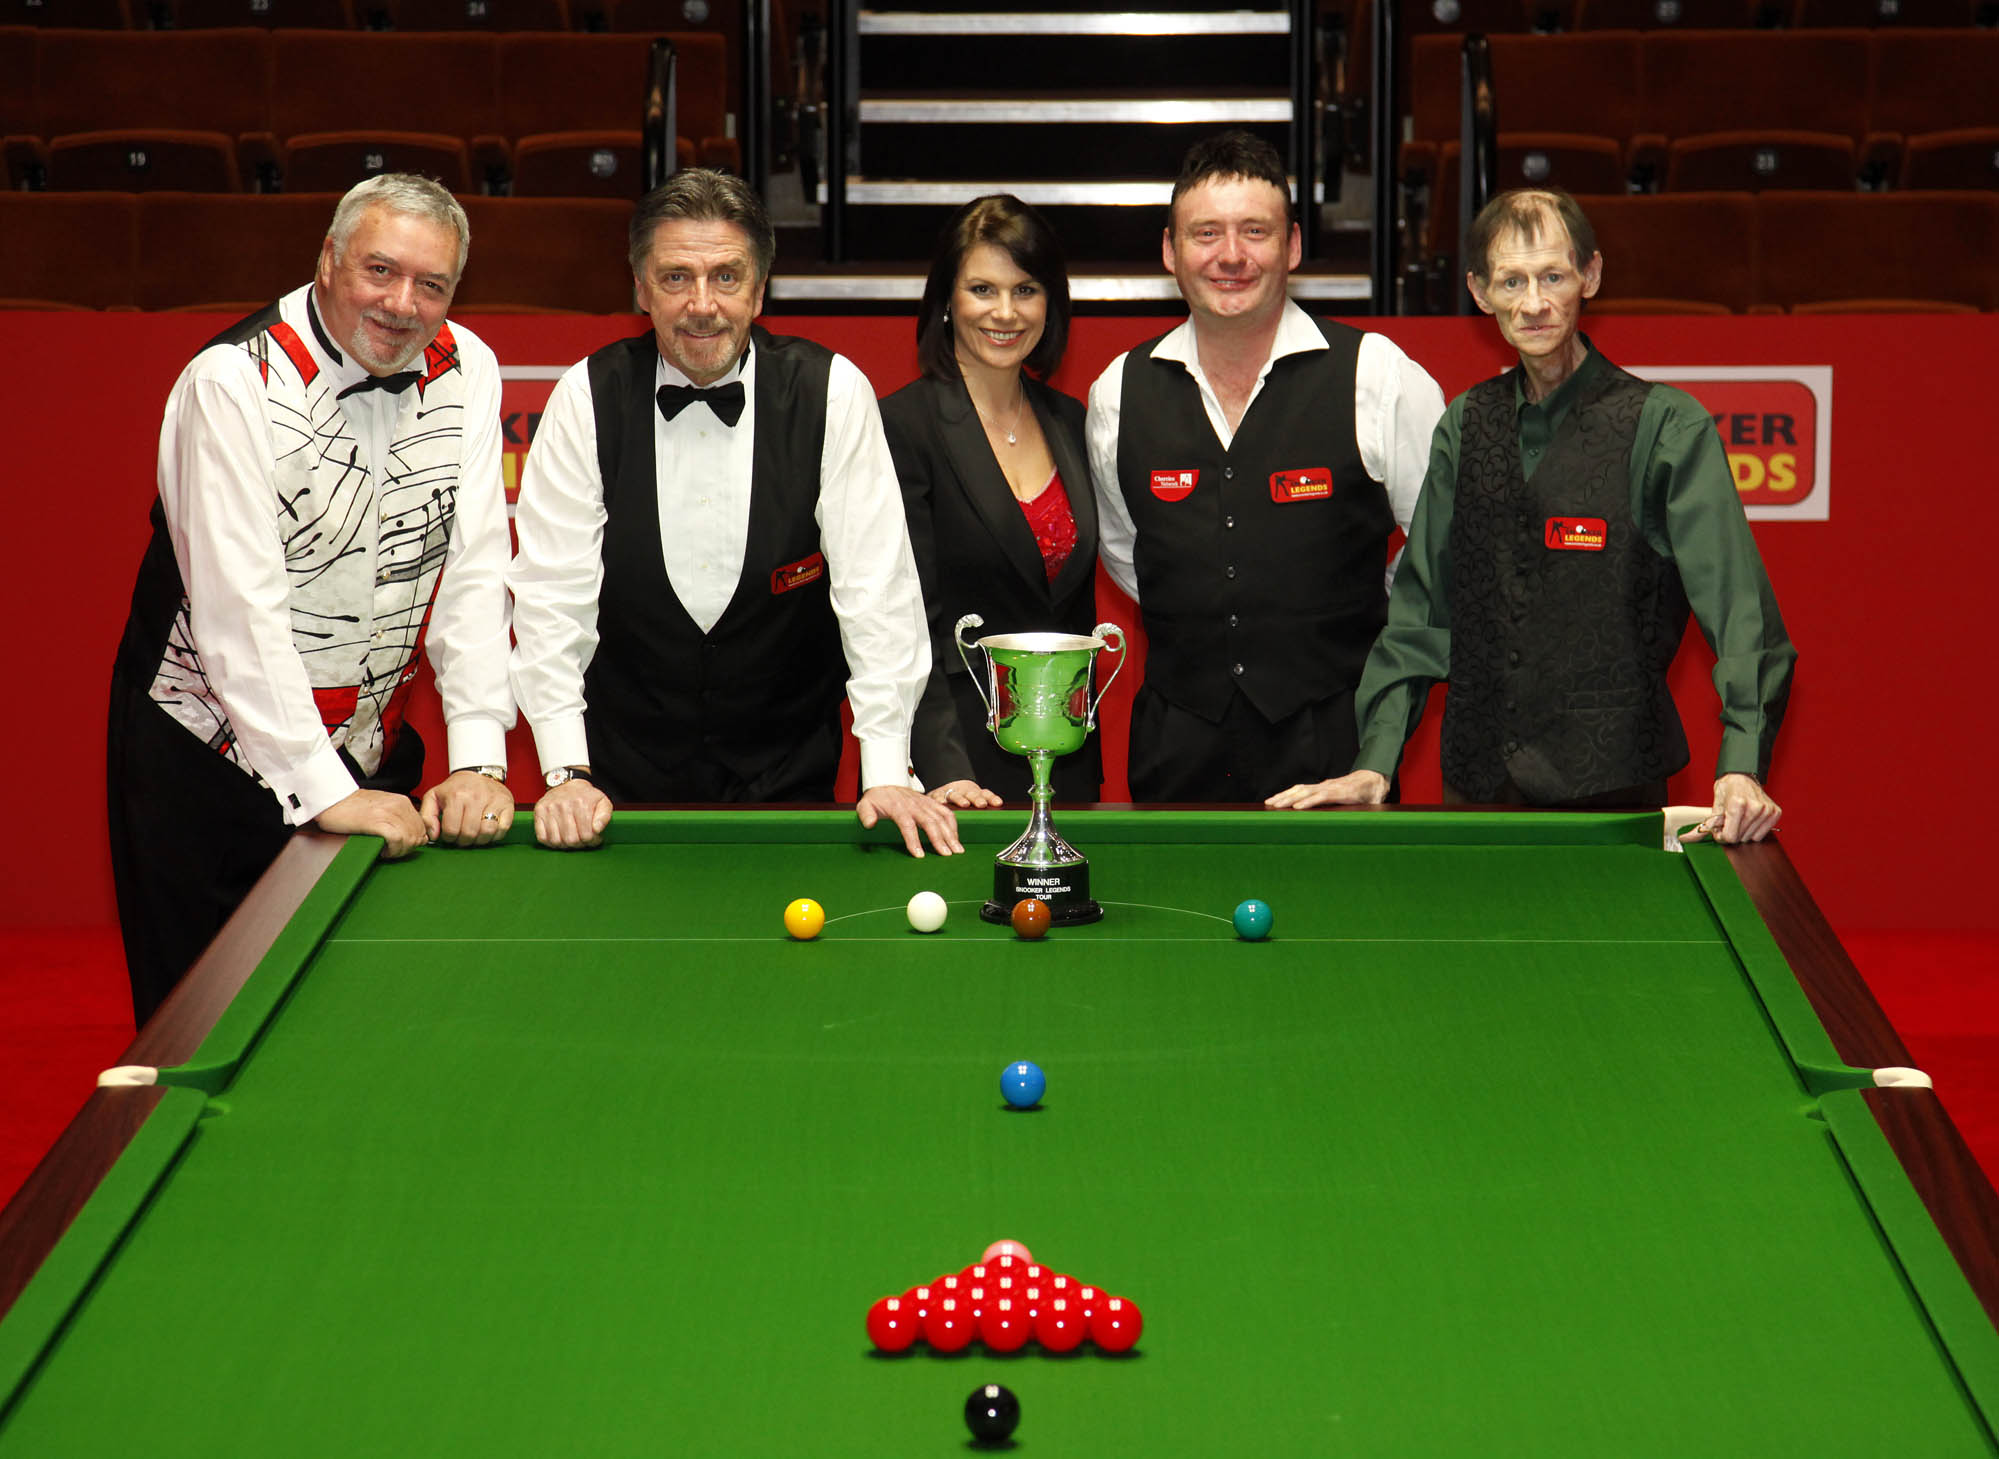 Snooker Legends - Virgo Thorburn Tabb White Higgins pic David Muscroft (30)